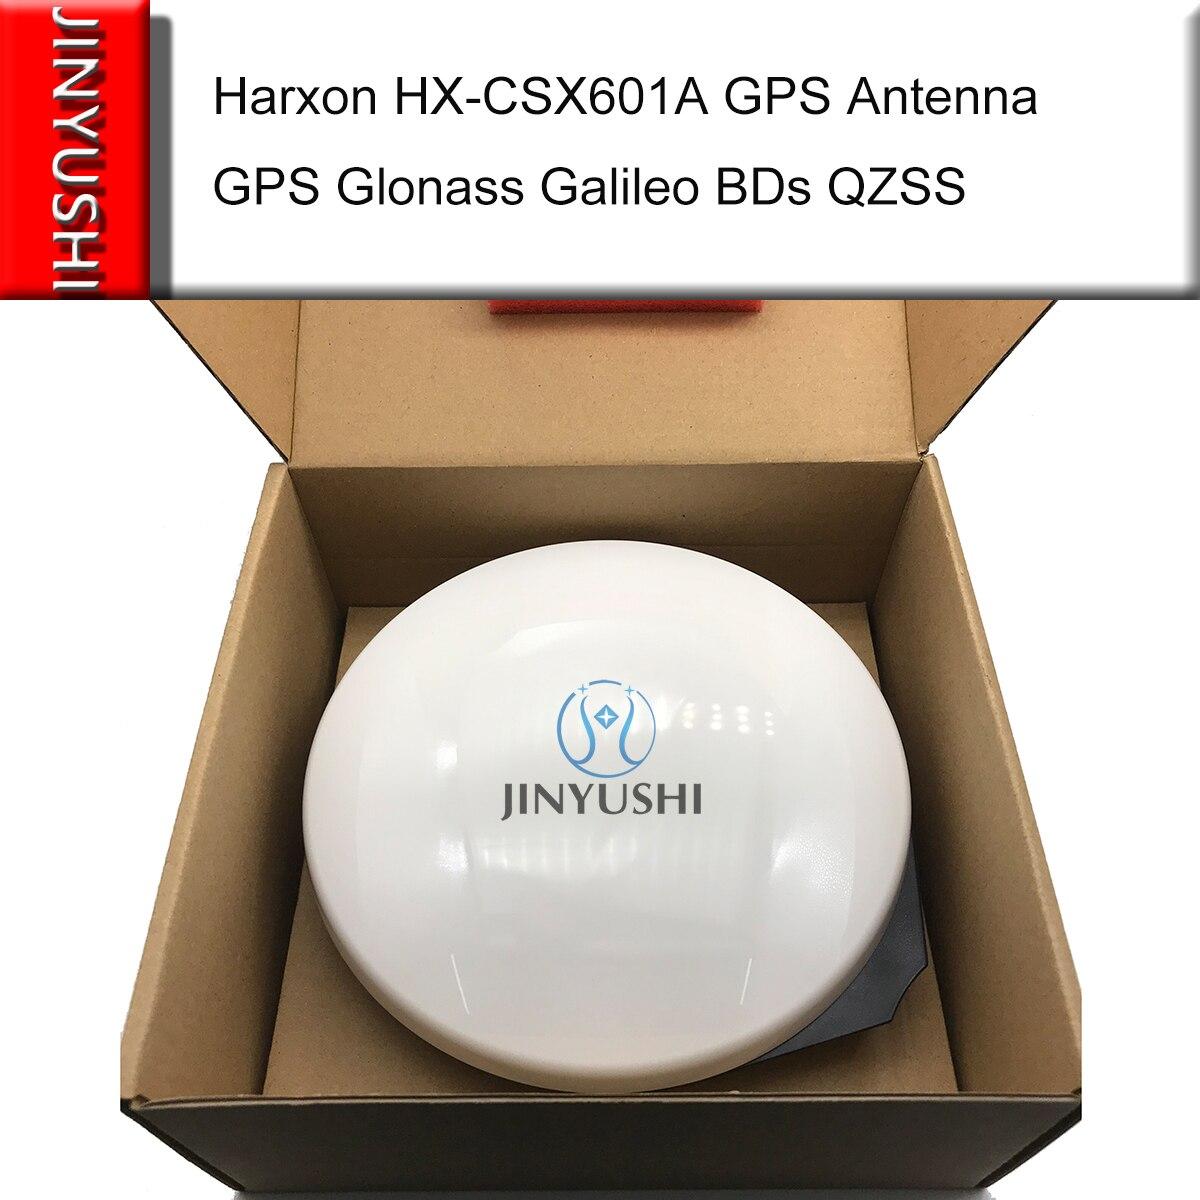 HX-CSX601A Harxon GPS L1 L2 L5 جلوناس غاليليو BDs QZSS كر محطة عالية الدقة GNSS المسح الفطر هوائي RTK استقبال